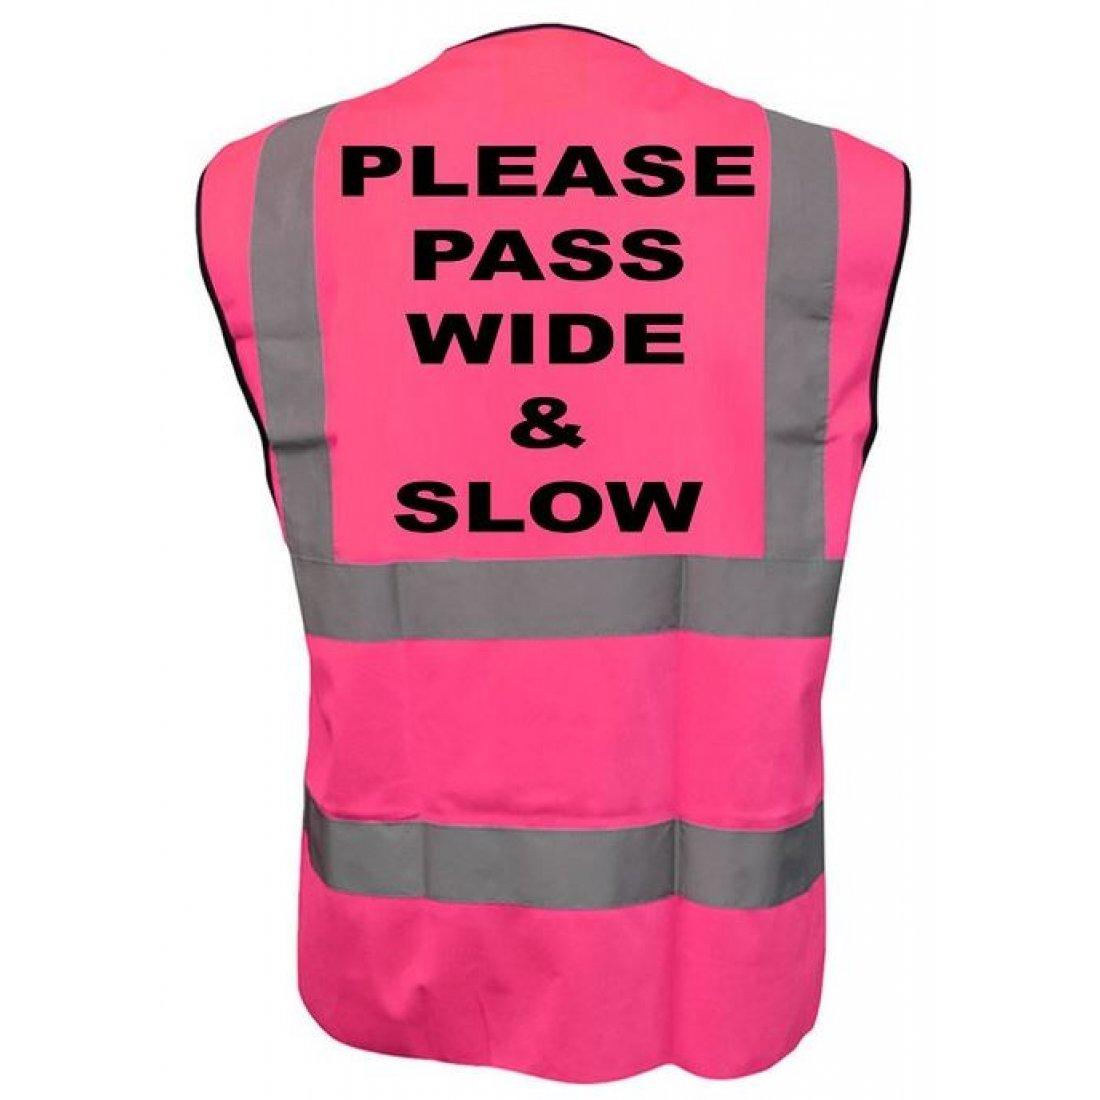 Please Pass Wide & Slow Printed Pink Adults Hi Vis Vest